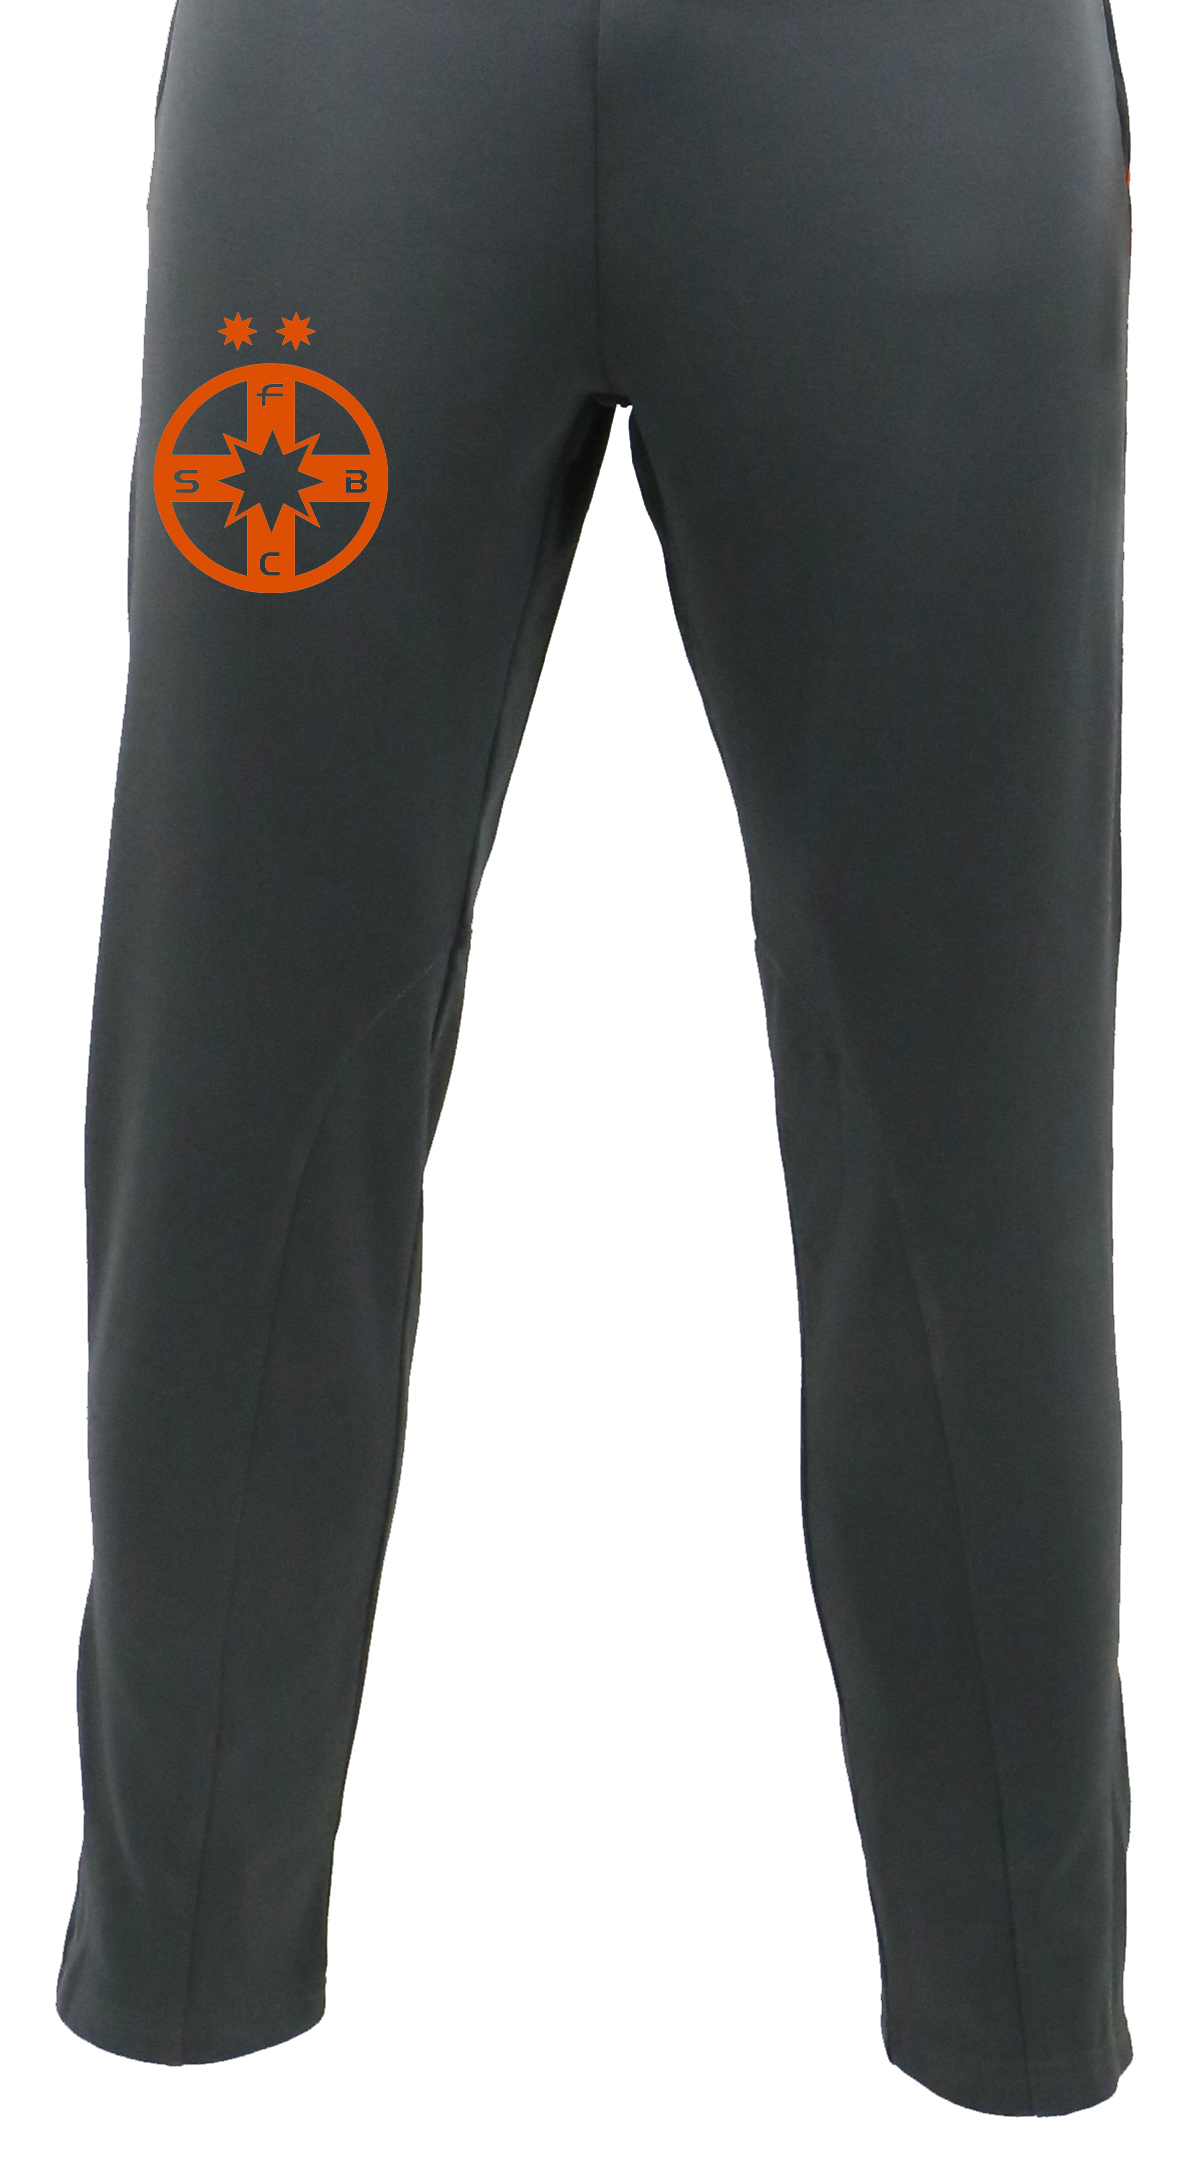 Pantalon trening adult produs sub licenta FCSB